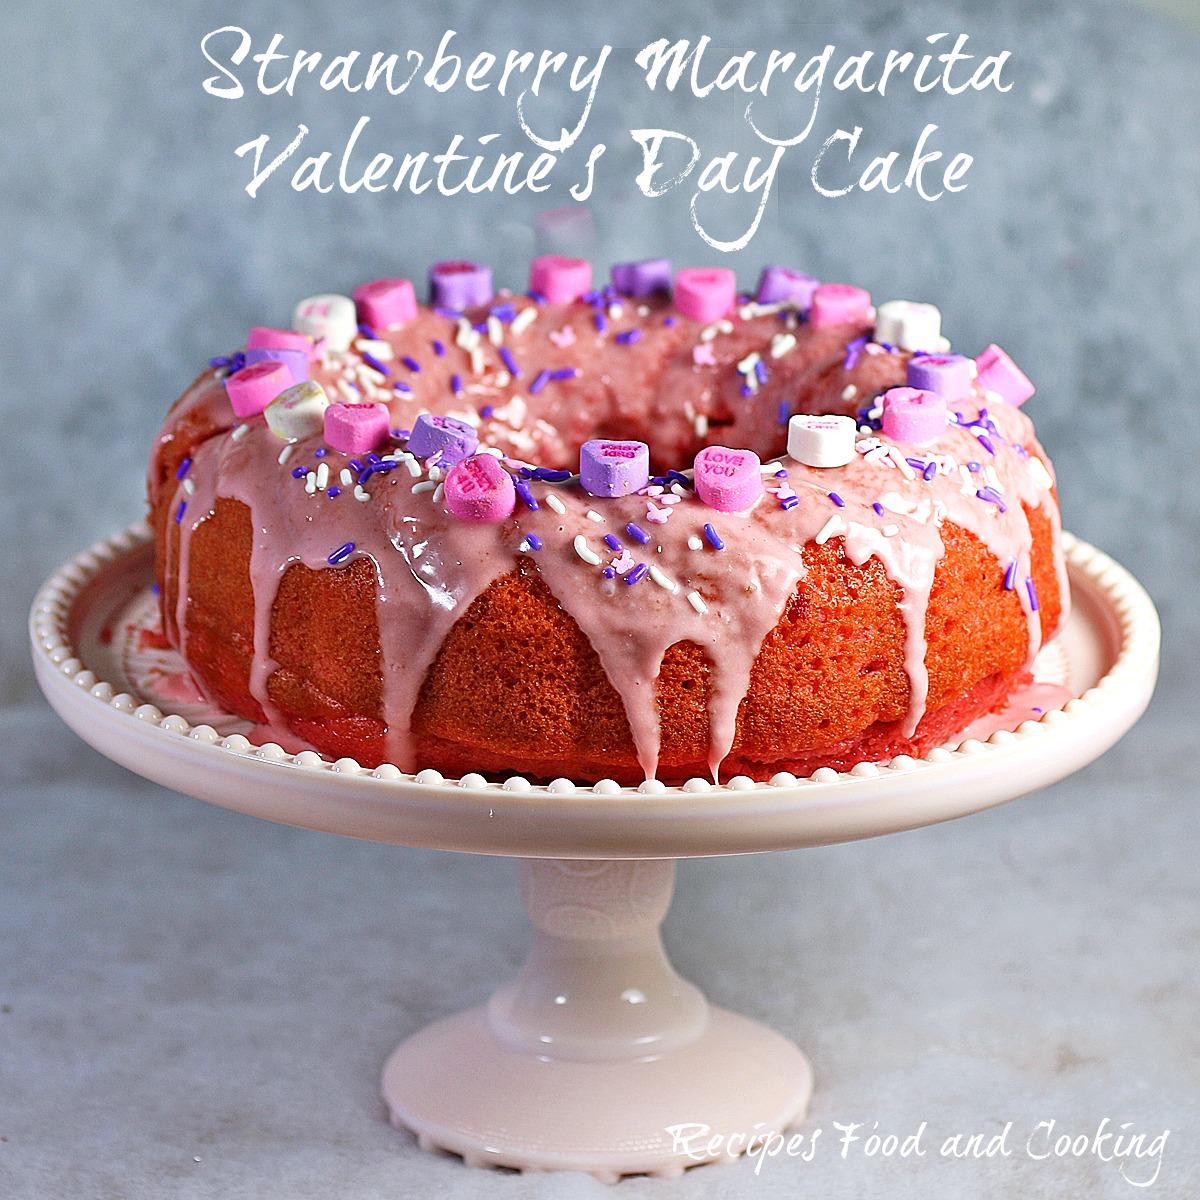 Strawberry Margarita Valentine's Day Cake